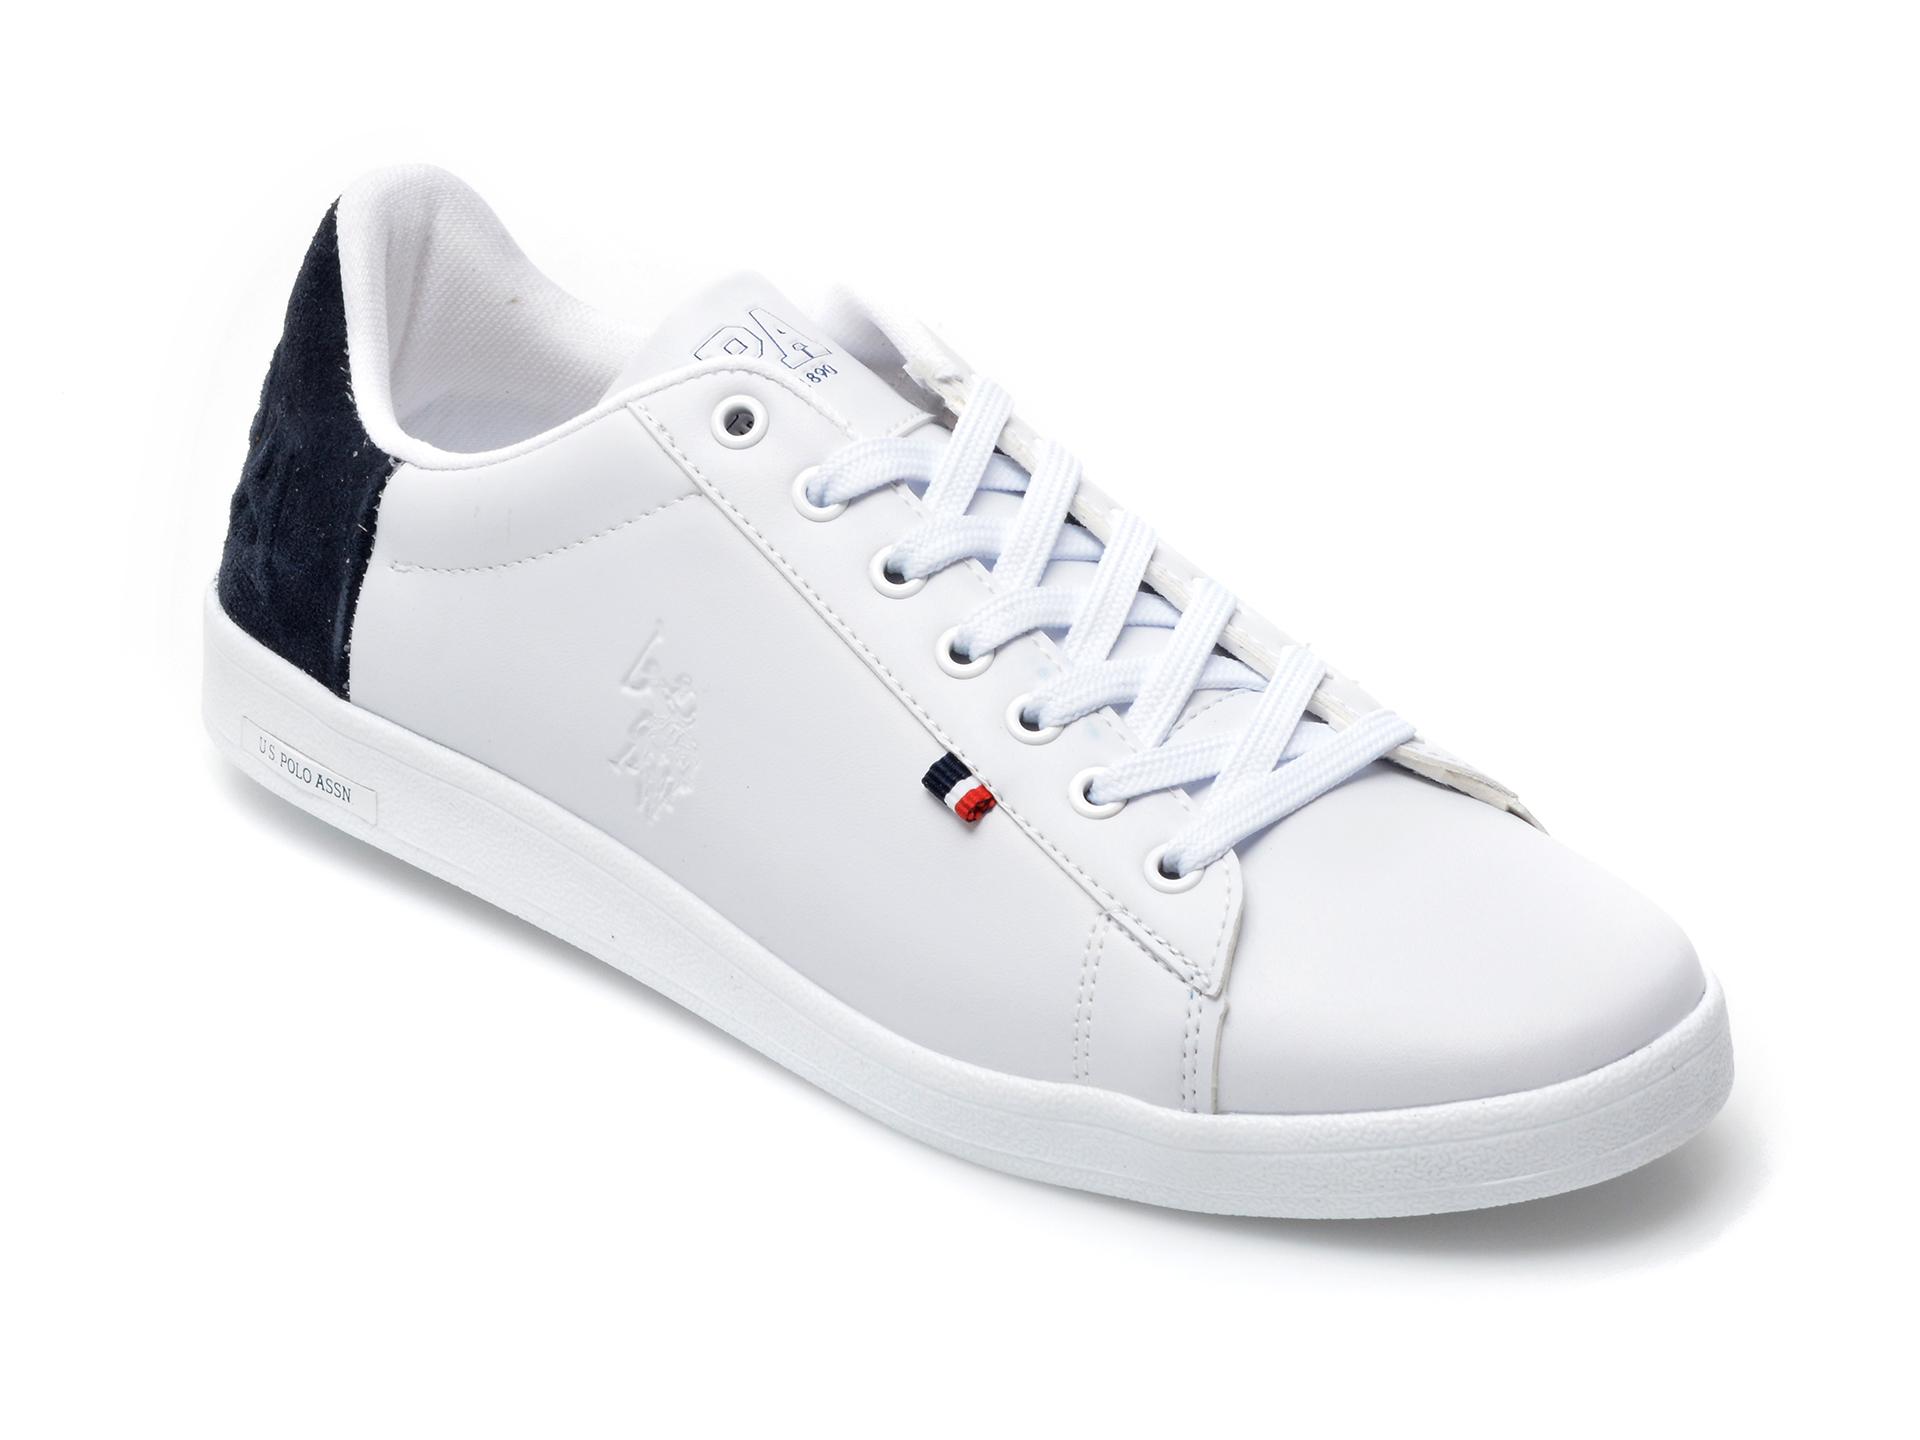 Pantofi sport US POLO ASSN albi, PEDR1FX, din piele ecologica imagine otter.ro